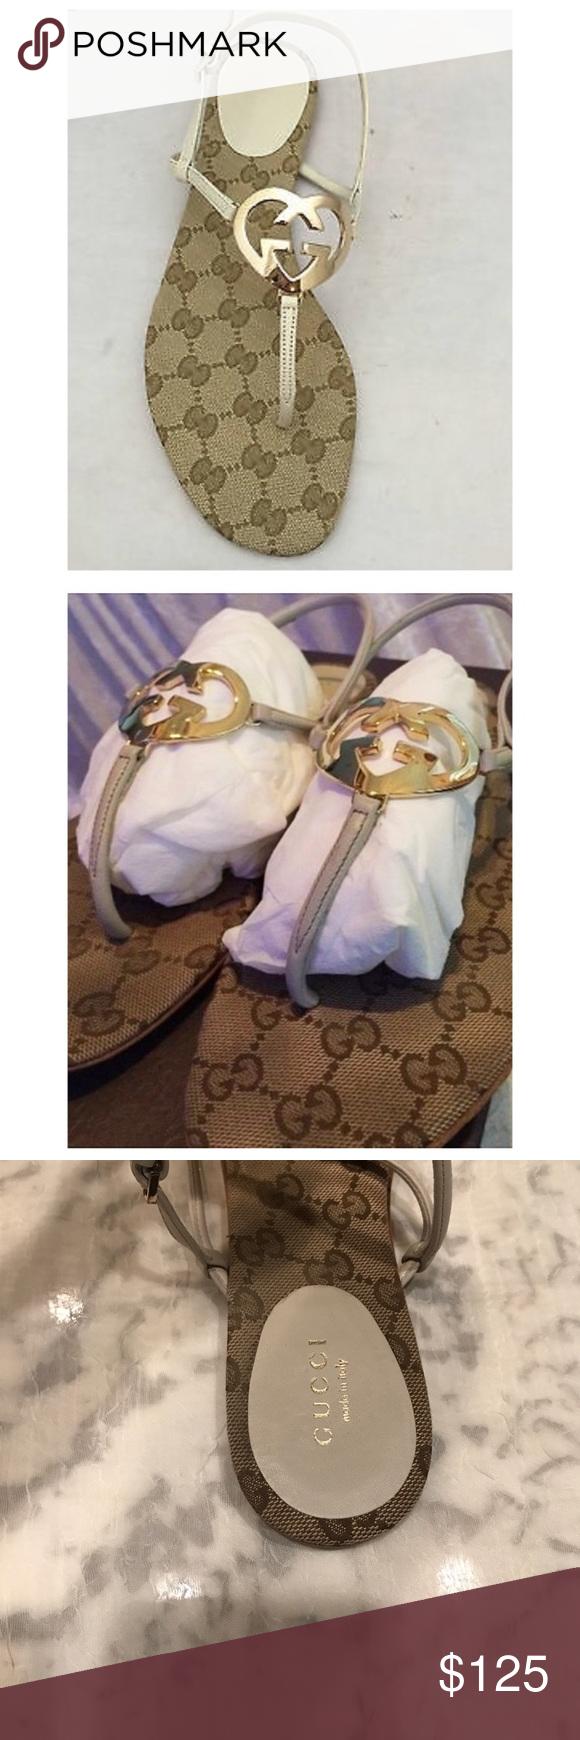 87e6112bc Gucci Gold interlocking G Heart Logo flat Sandal Gucci signature canvas flat  sandal, with interlocking G heart logo. Used sandal, with visible signs of  use, ...